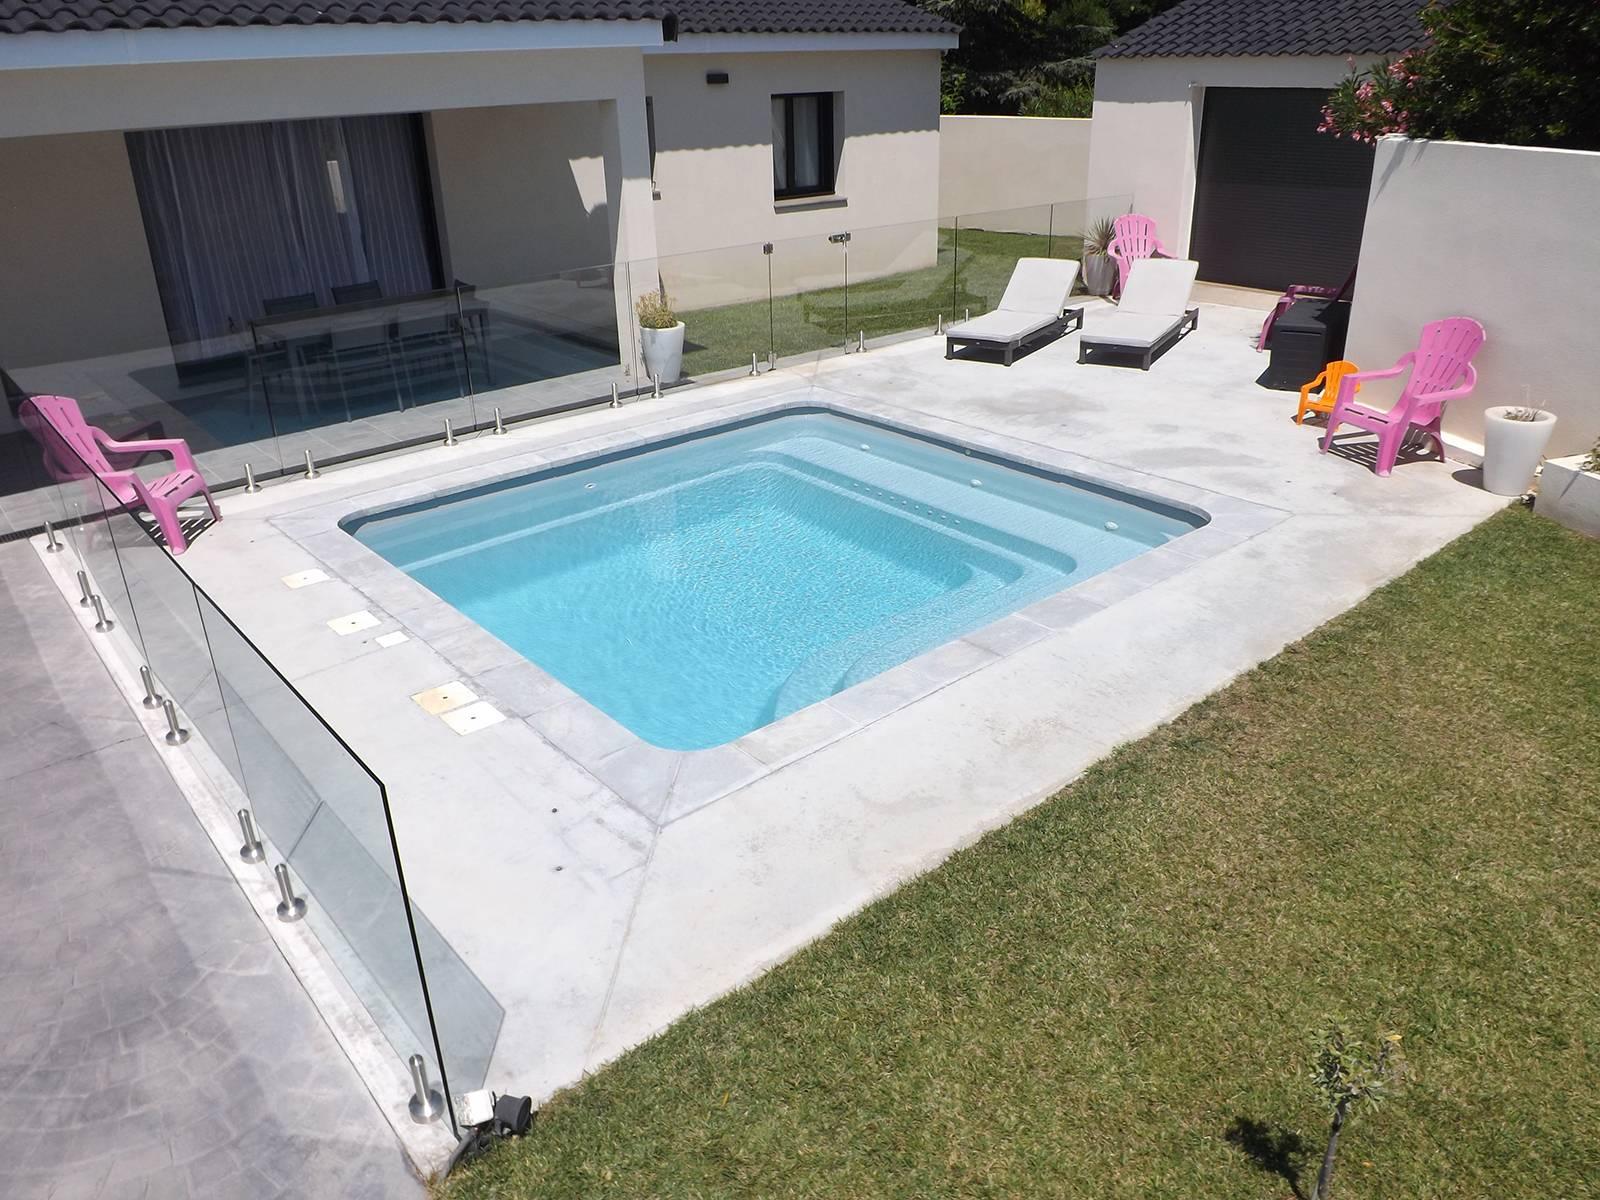 Installer une piscine carrée chez soi